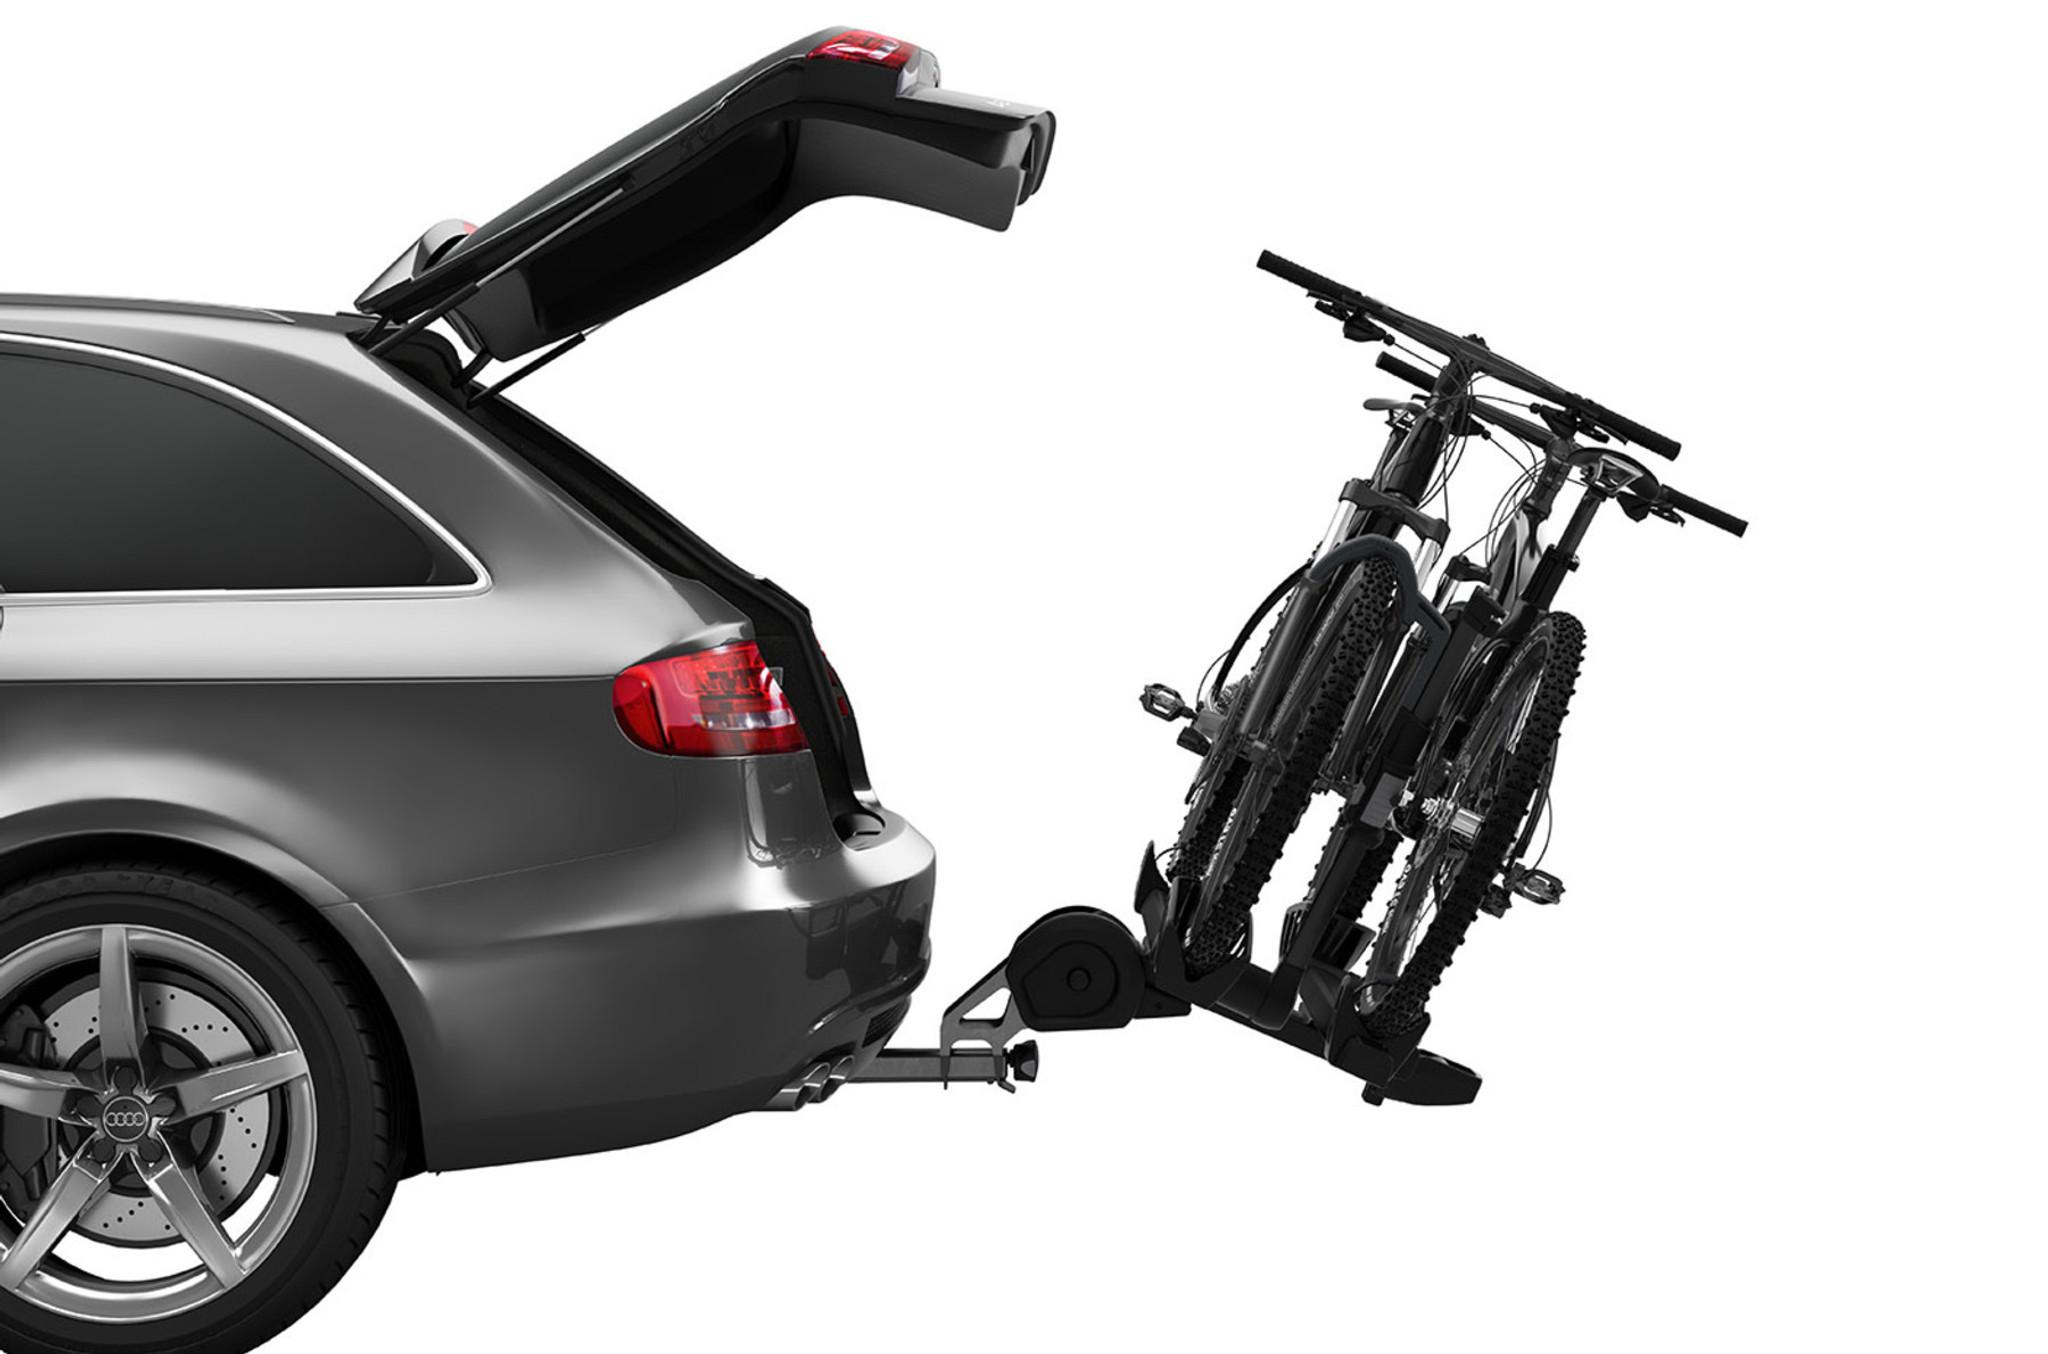 Choosing the Right Thule Bike Rack